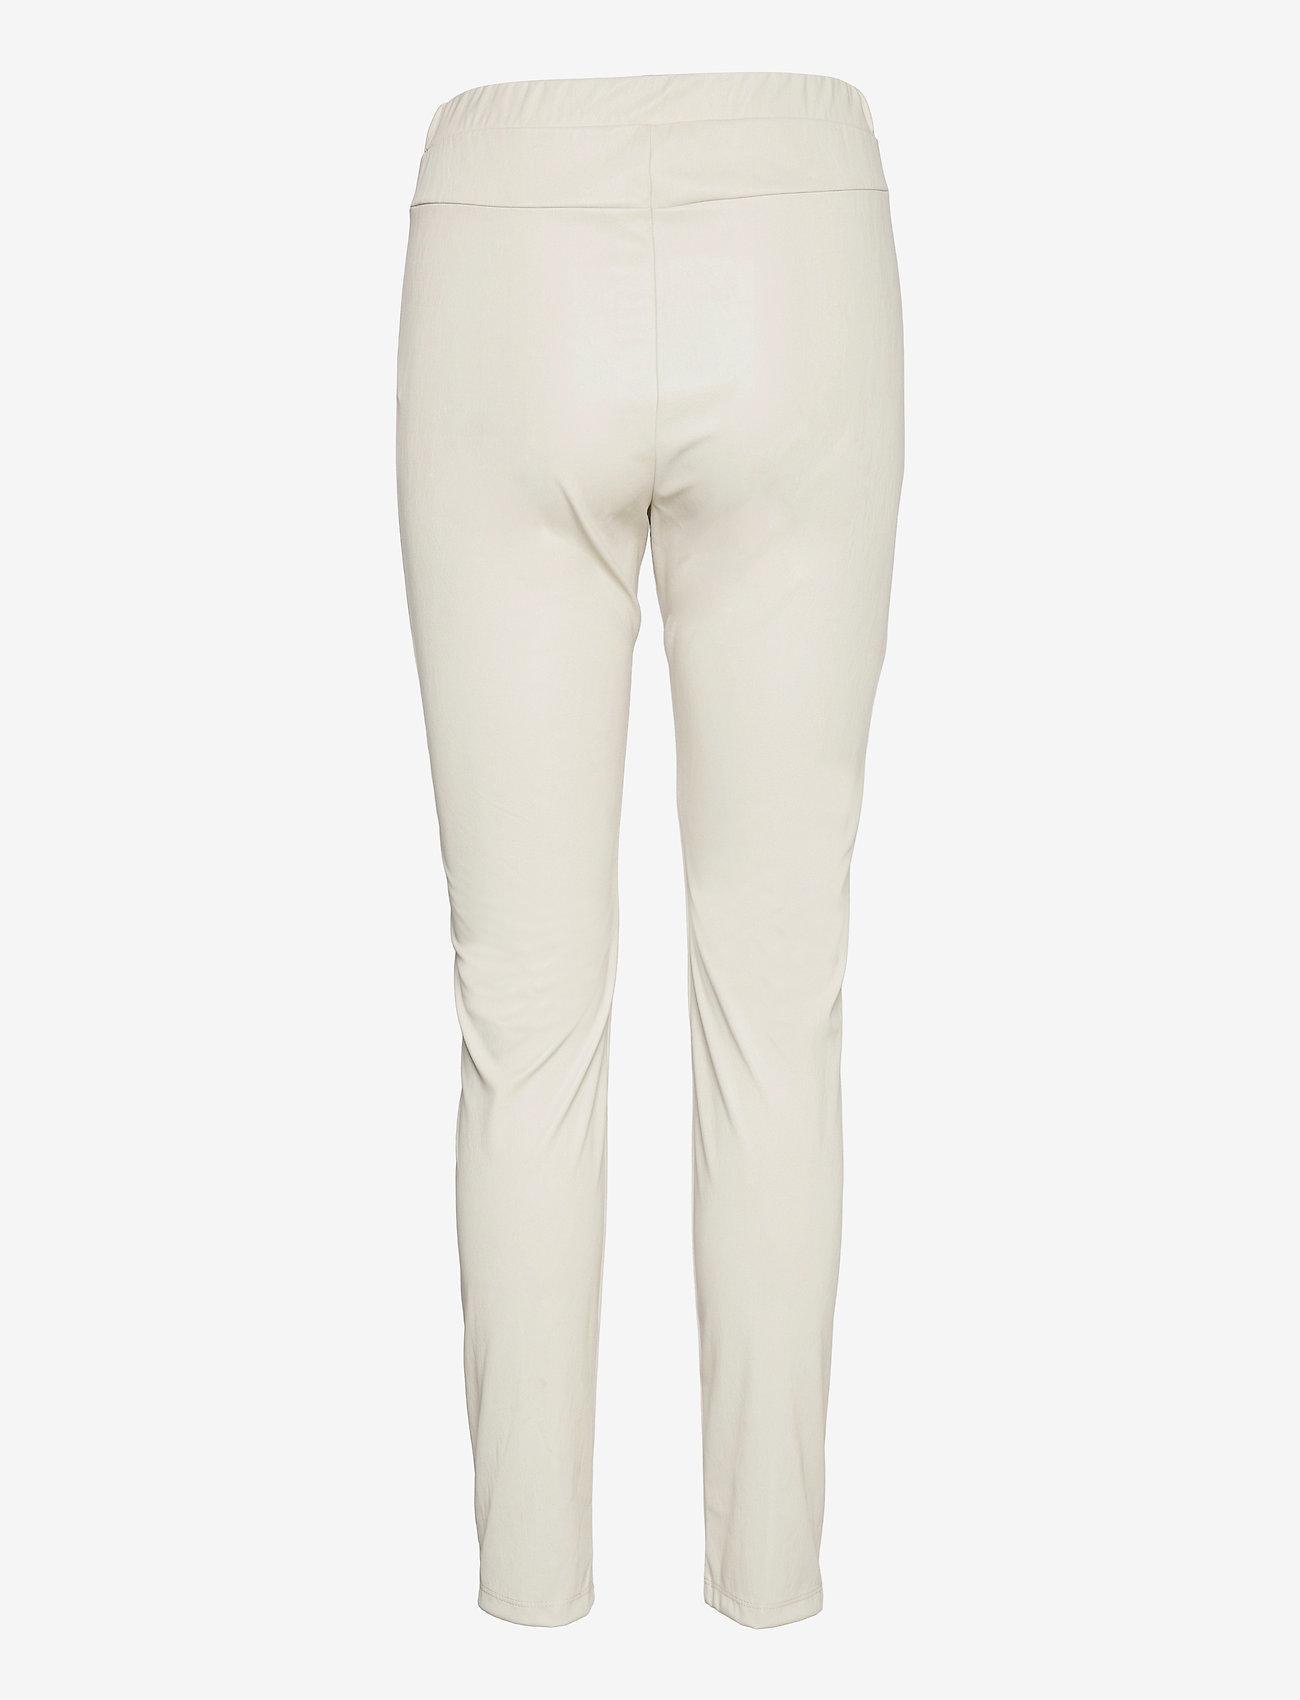 Max Mara Leisure - RANGHI - leather trousers - beige - 1